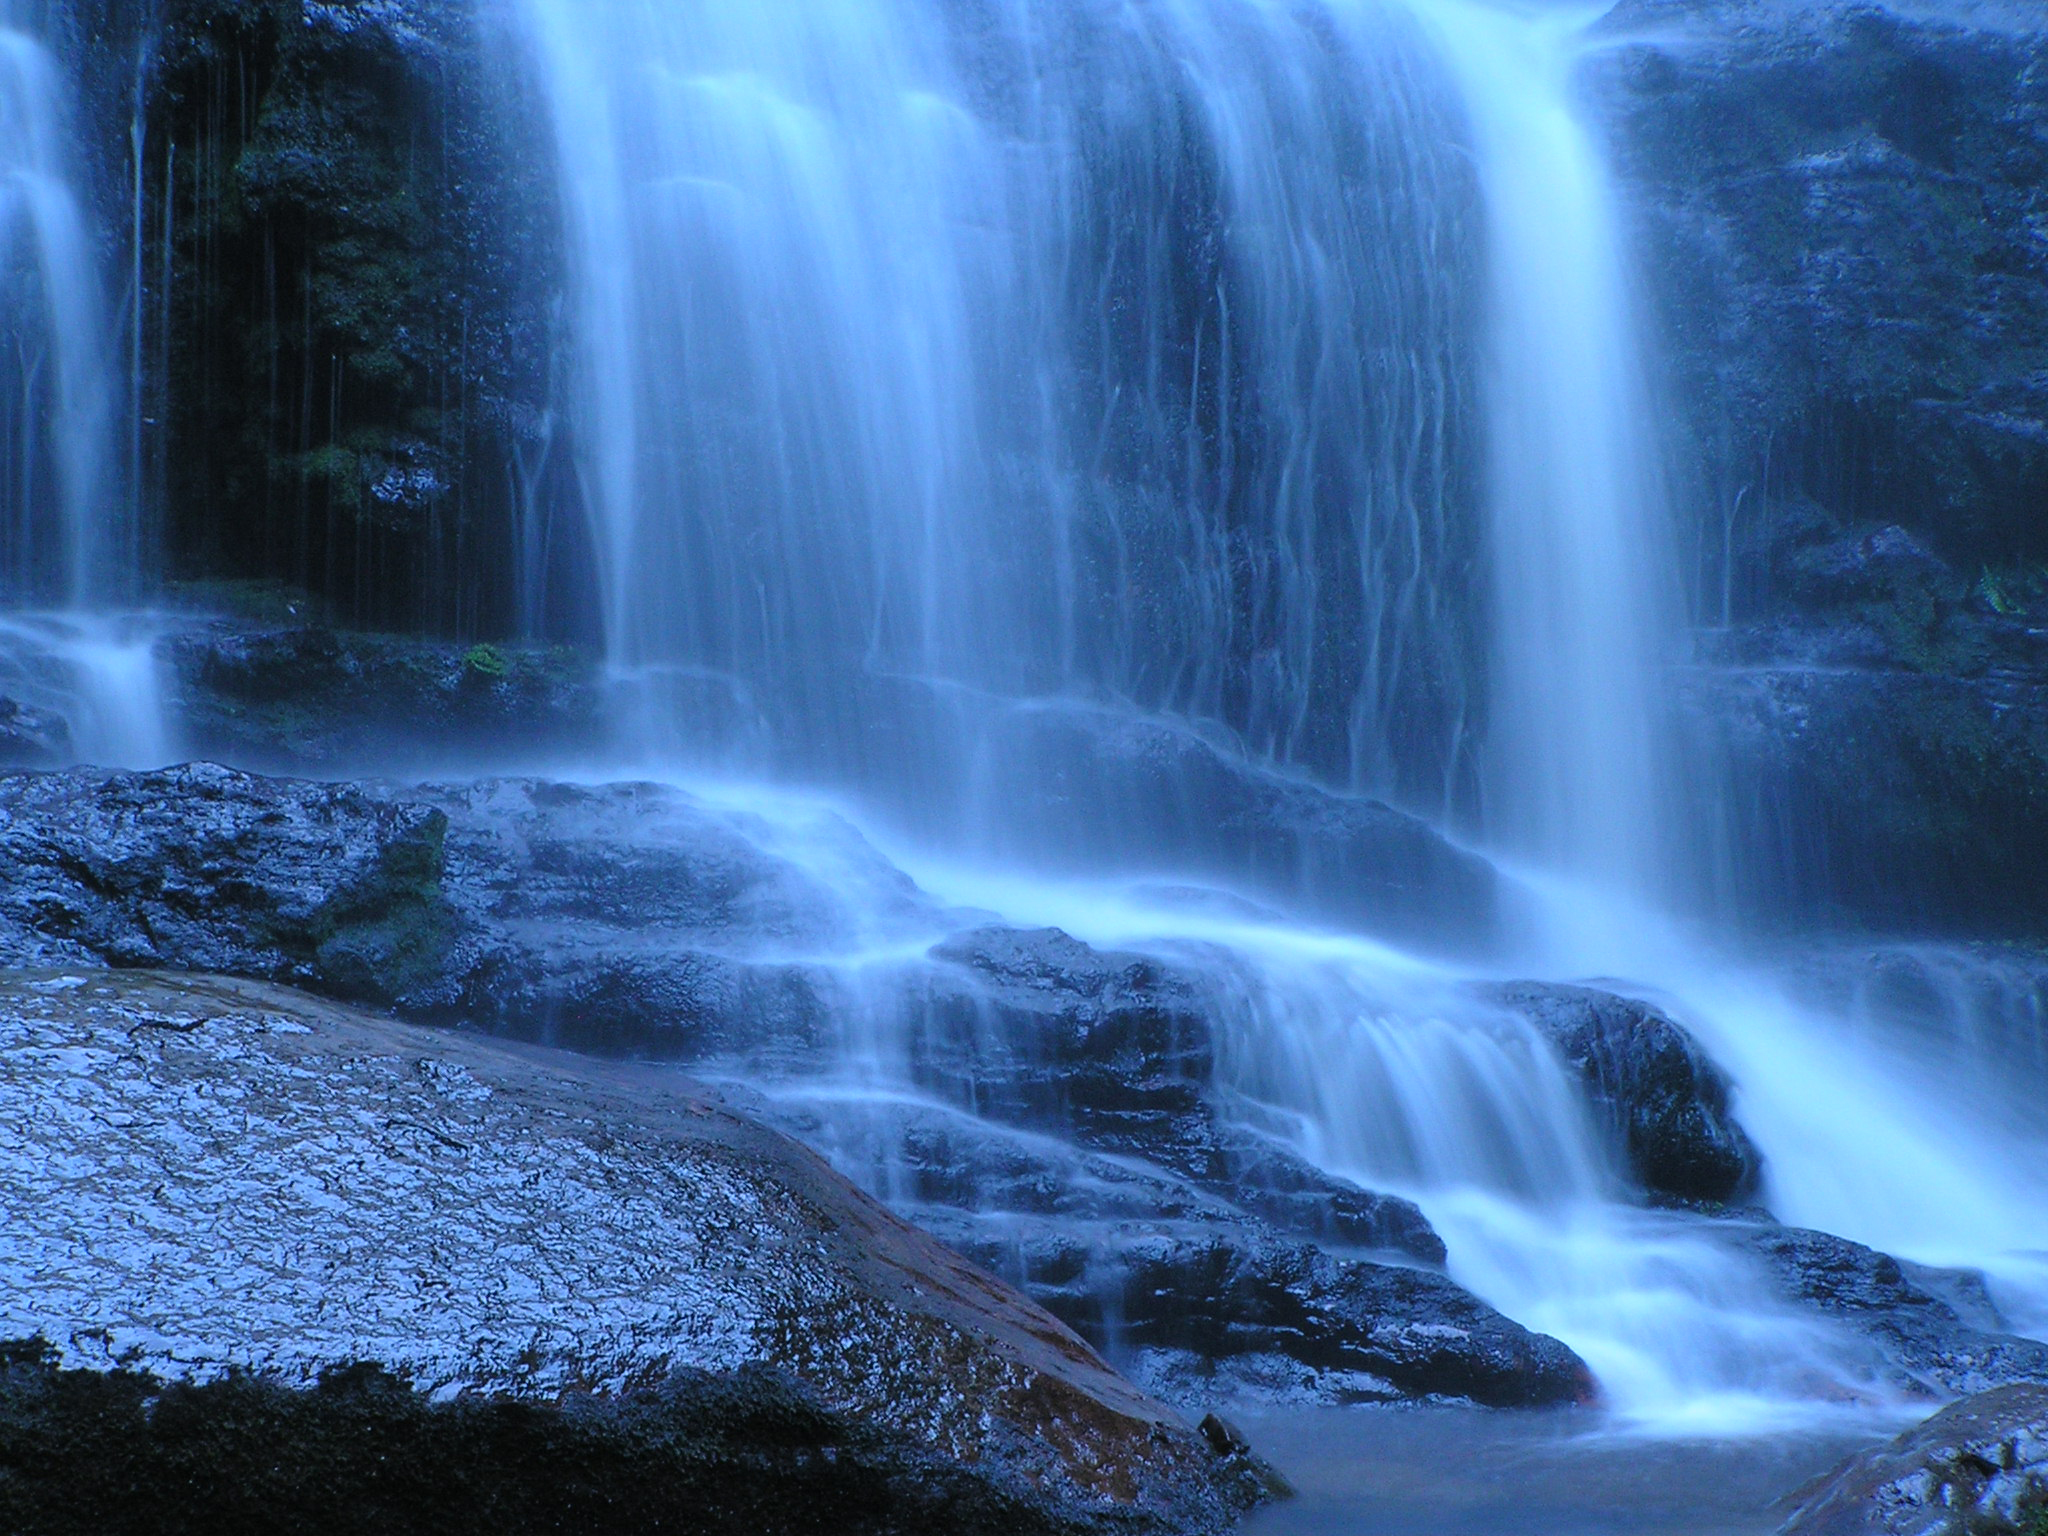 wallpaper wallpaper downloads Waterfall in Tasmania Australia 2048x1536